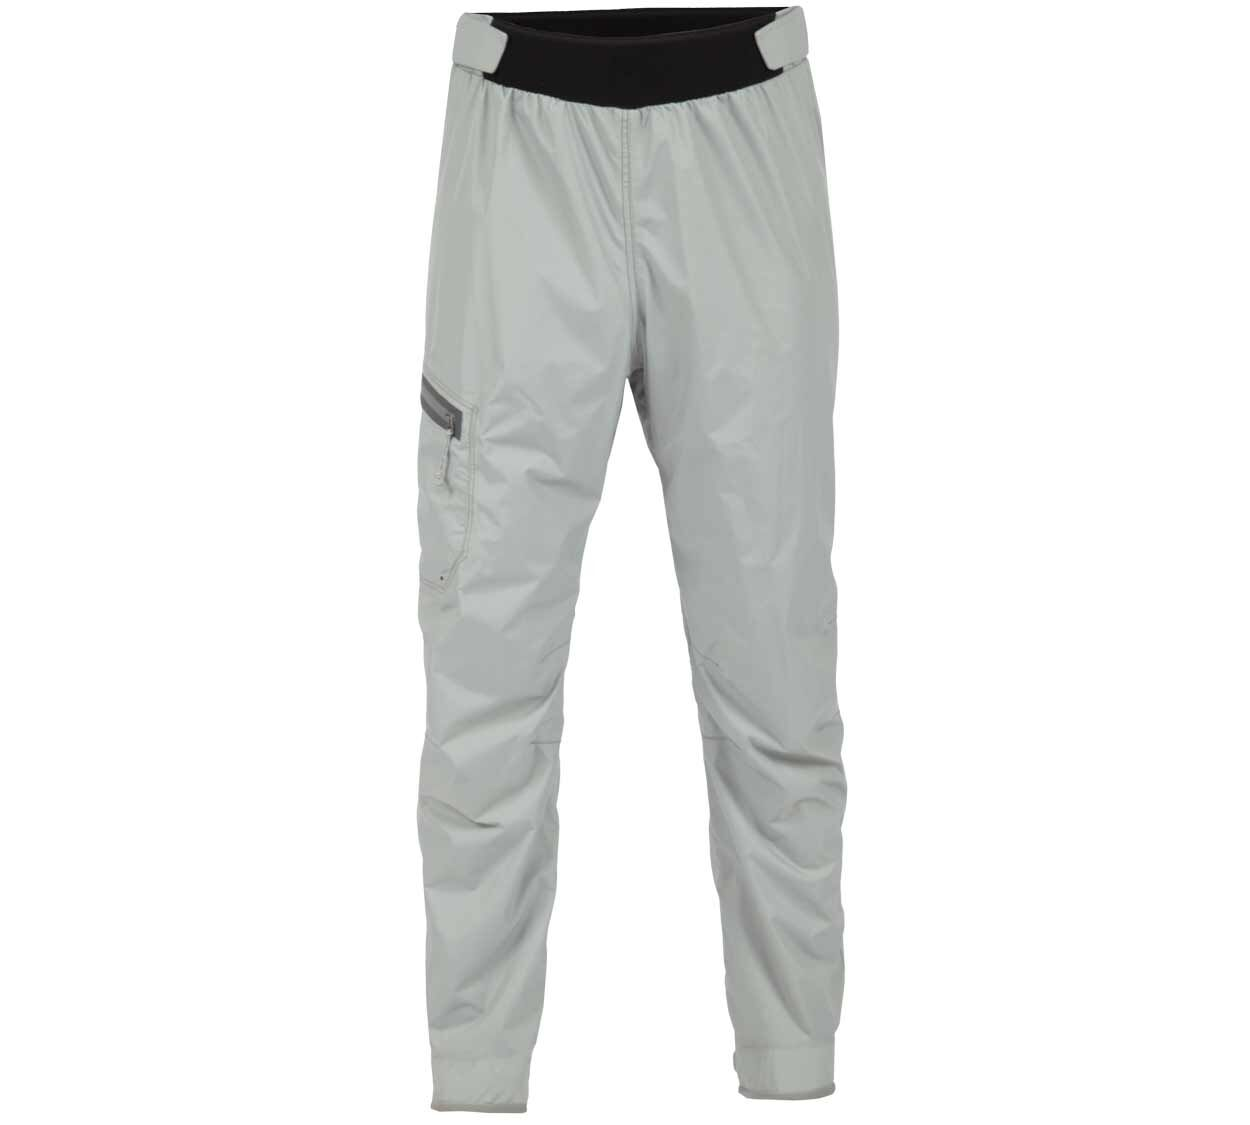 Kokatat Stance Pants - Men's / Front View